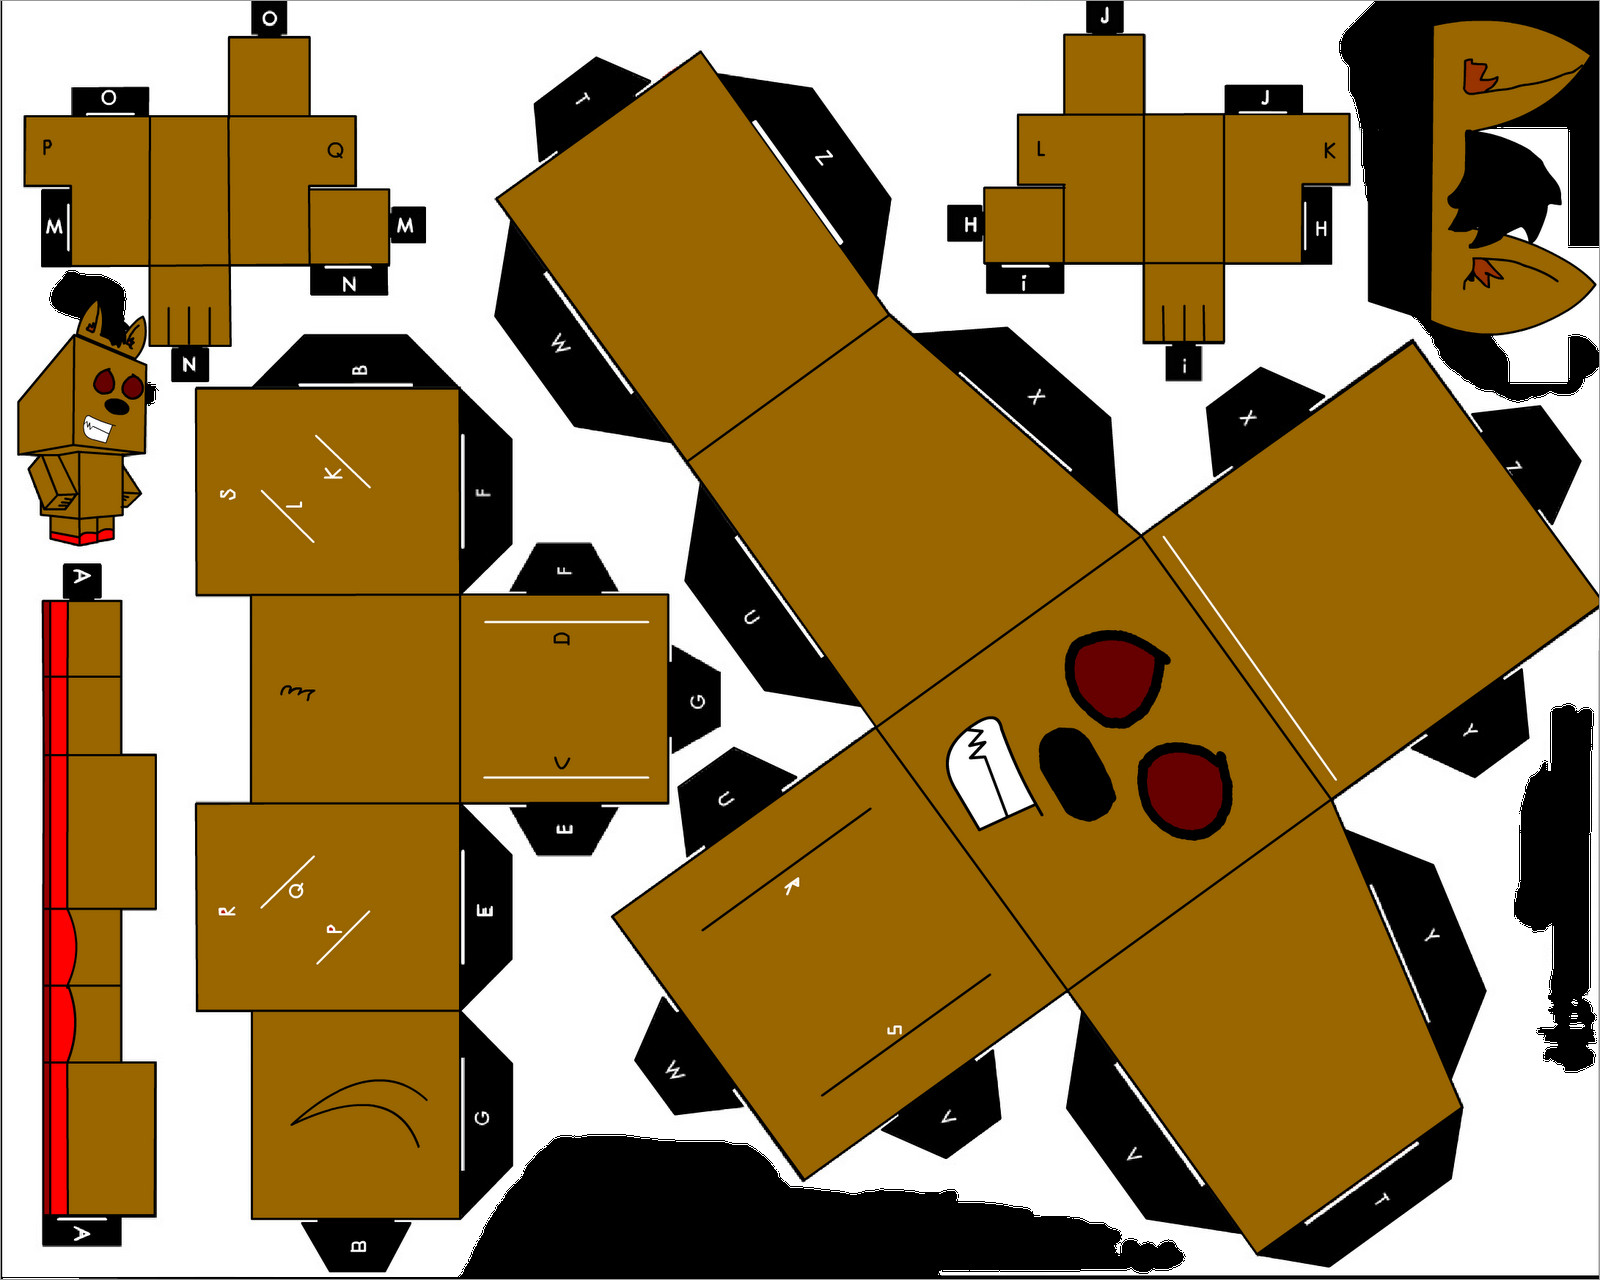 Minecraft Papercraft Models Free Download Papercraft Templates Minecraft